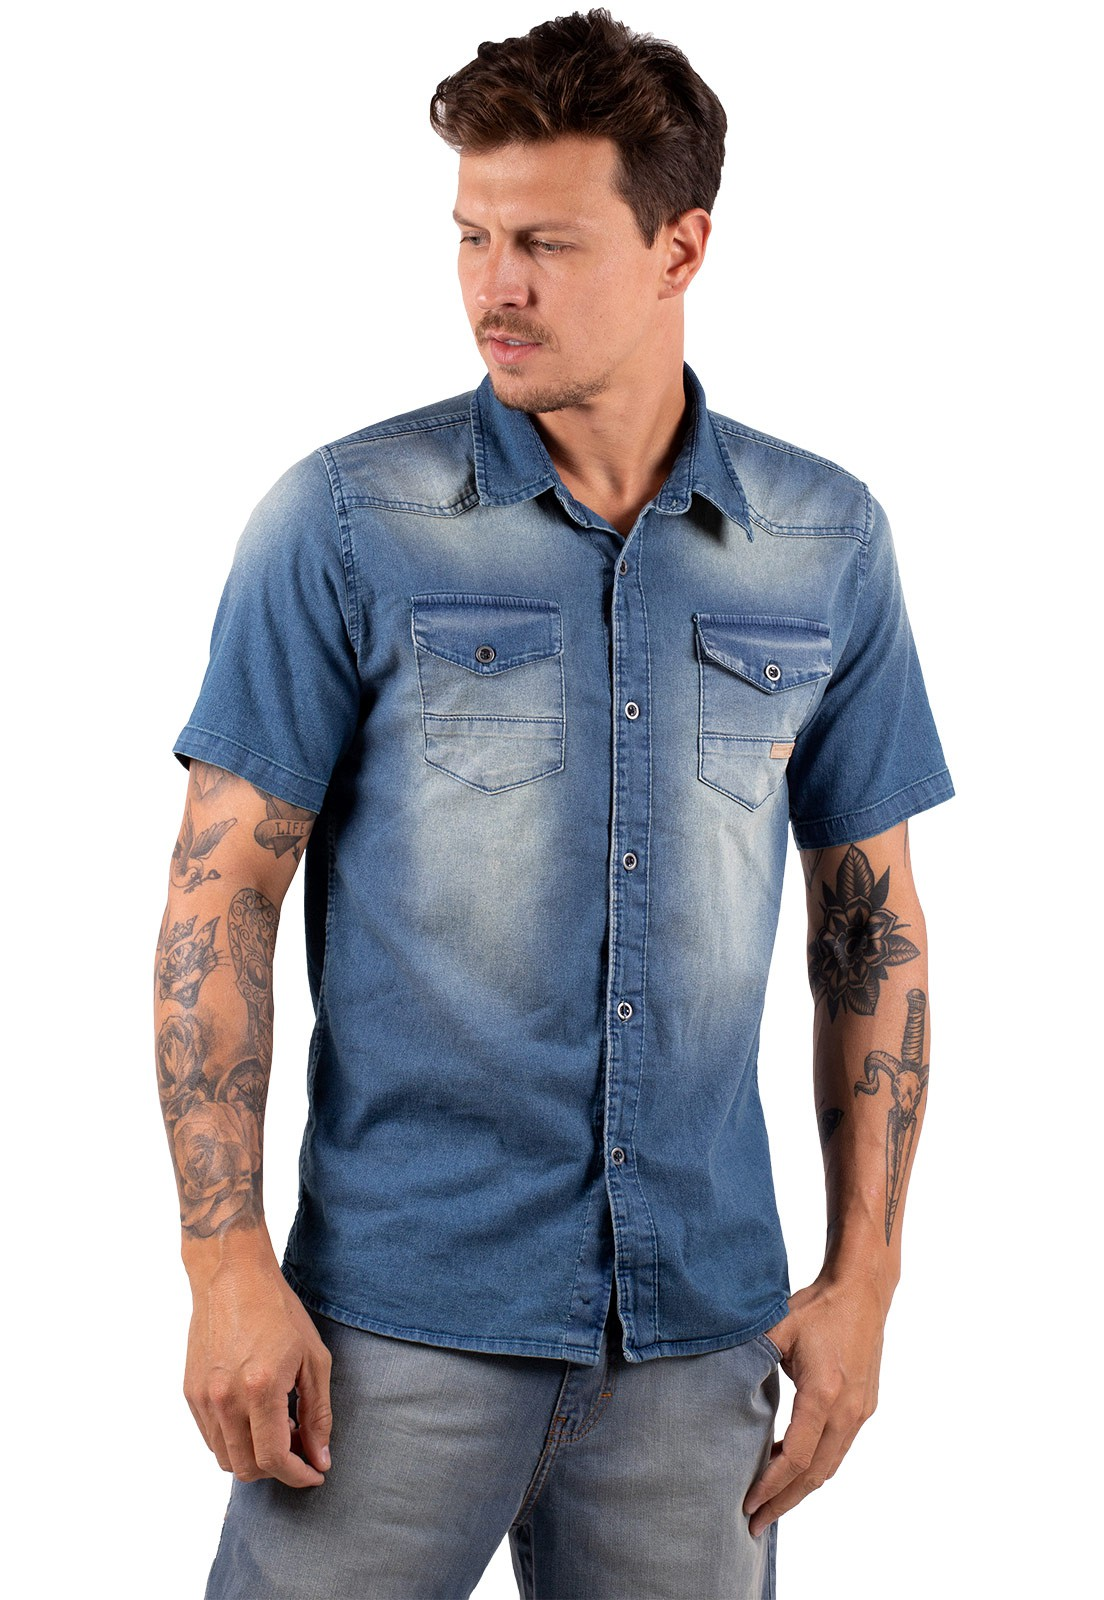 Camisa Vida Marinha Manga Curta Jeans Azul